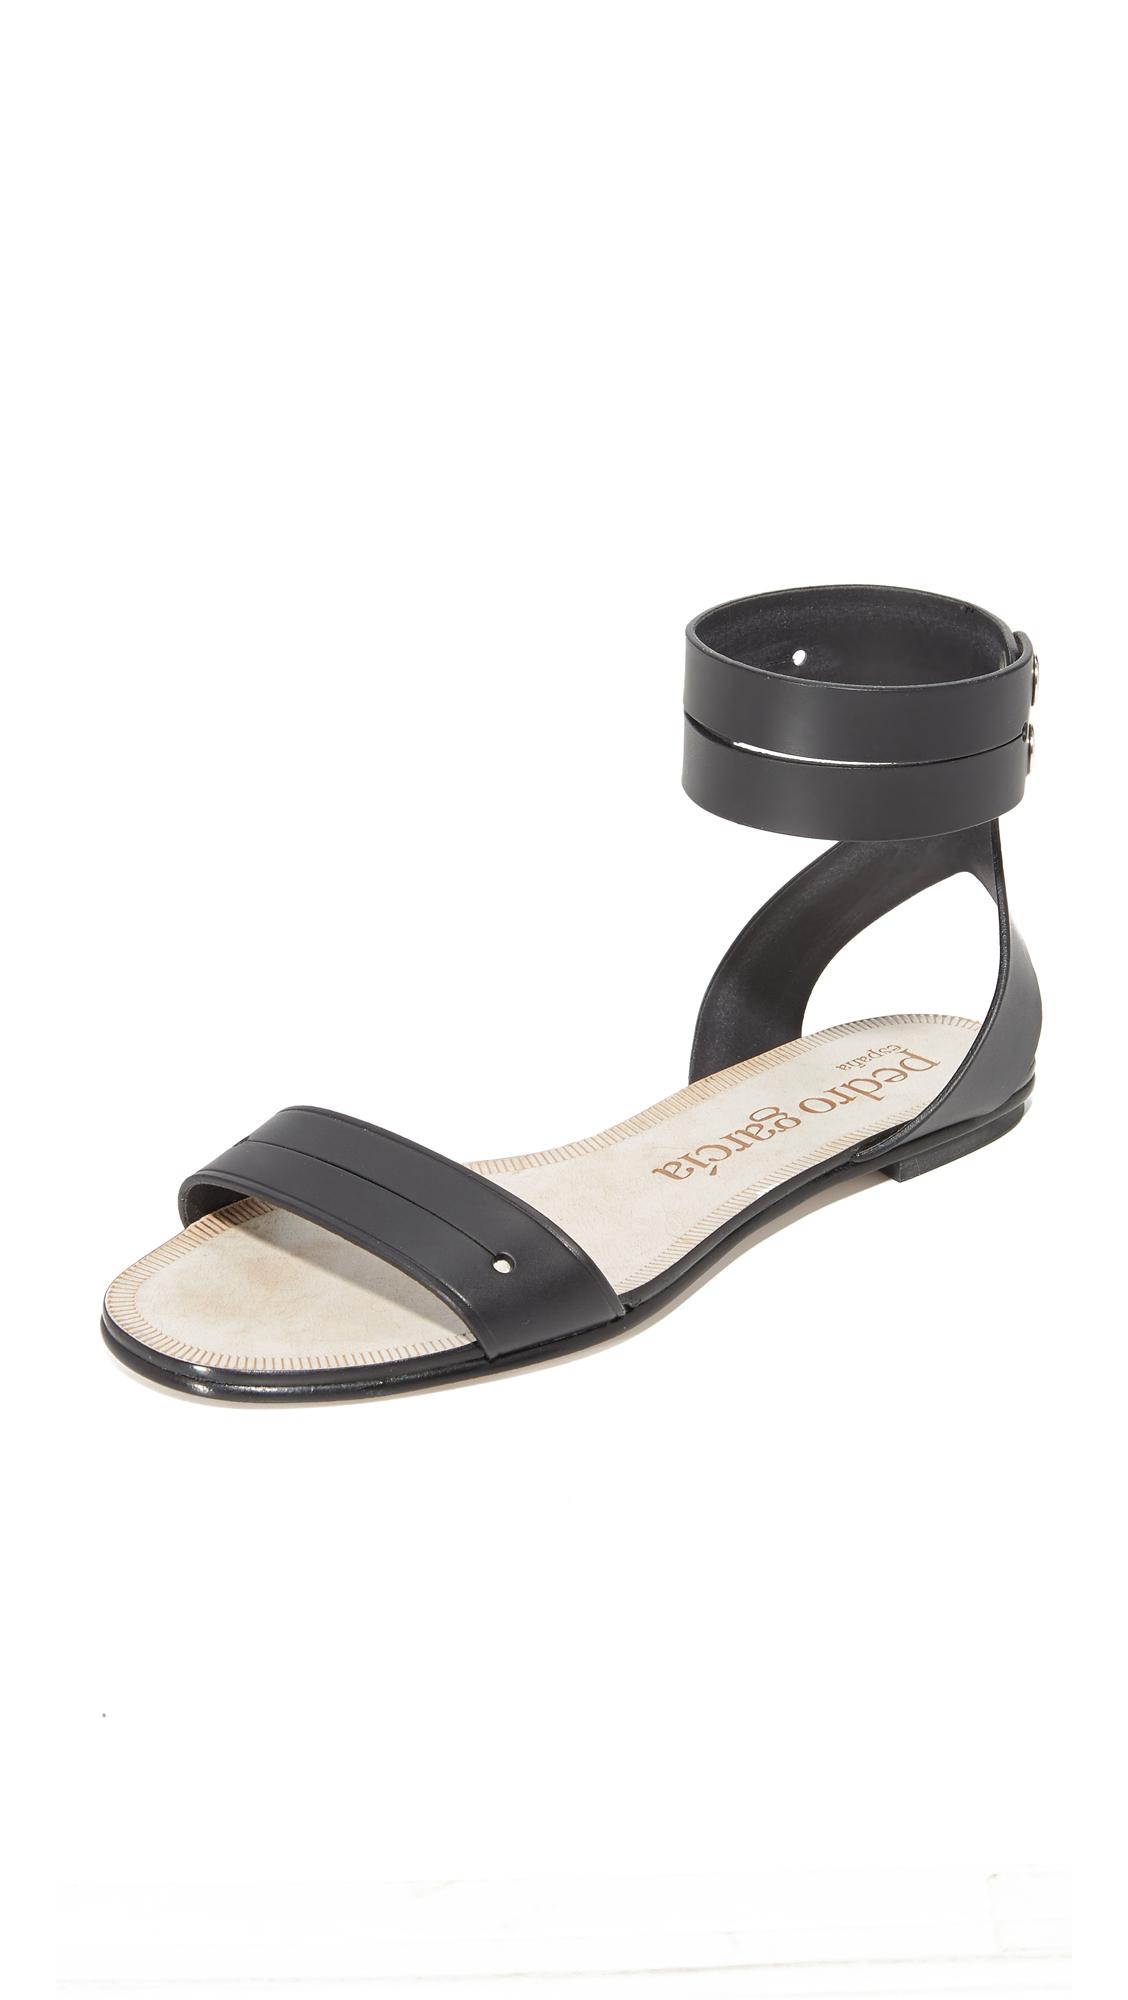 Pedro Garcia Etel Flat Sandals - Black